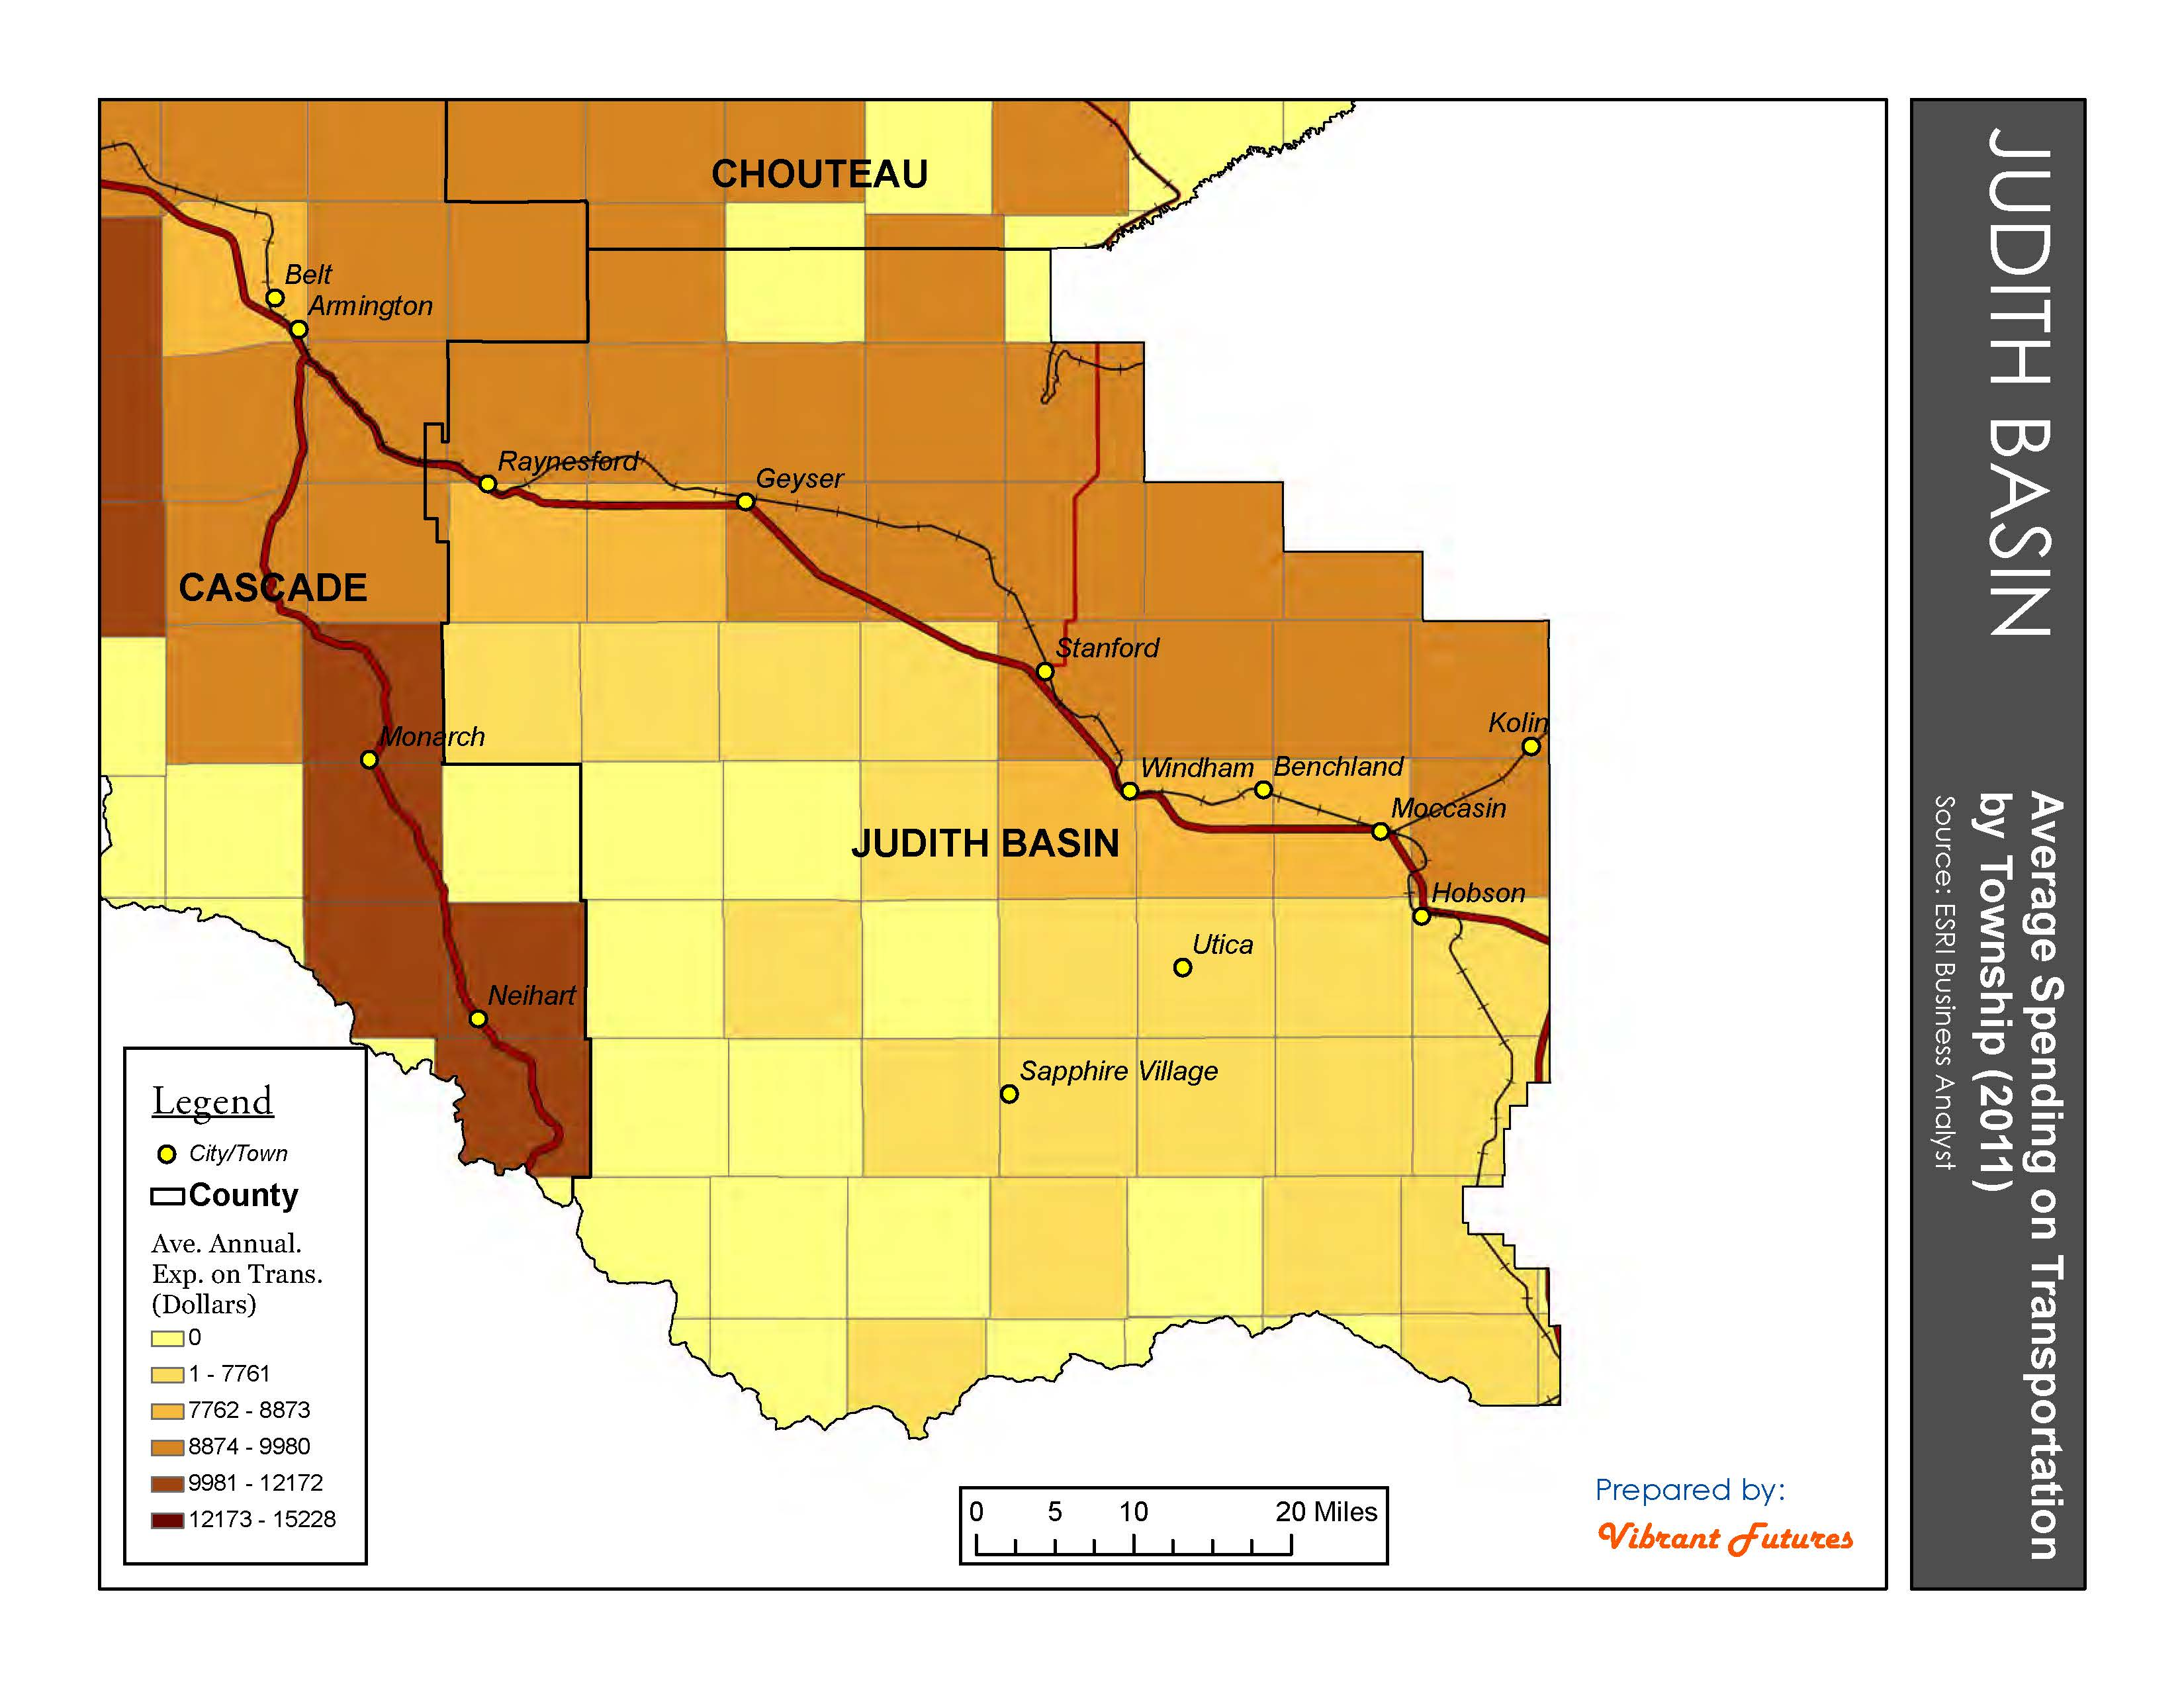 Average Expenditure on Transportation Judith Basin County